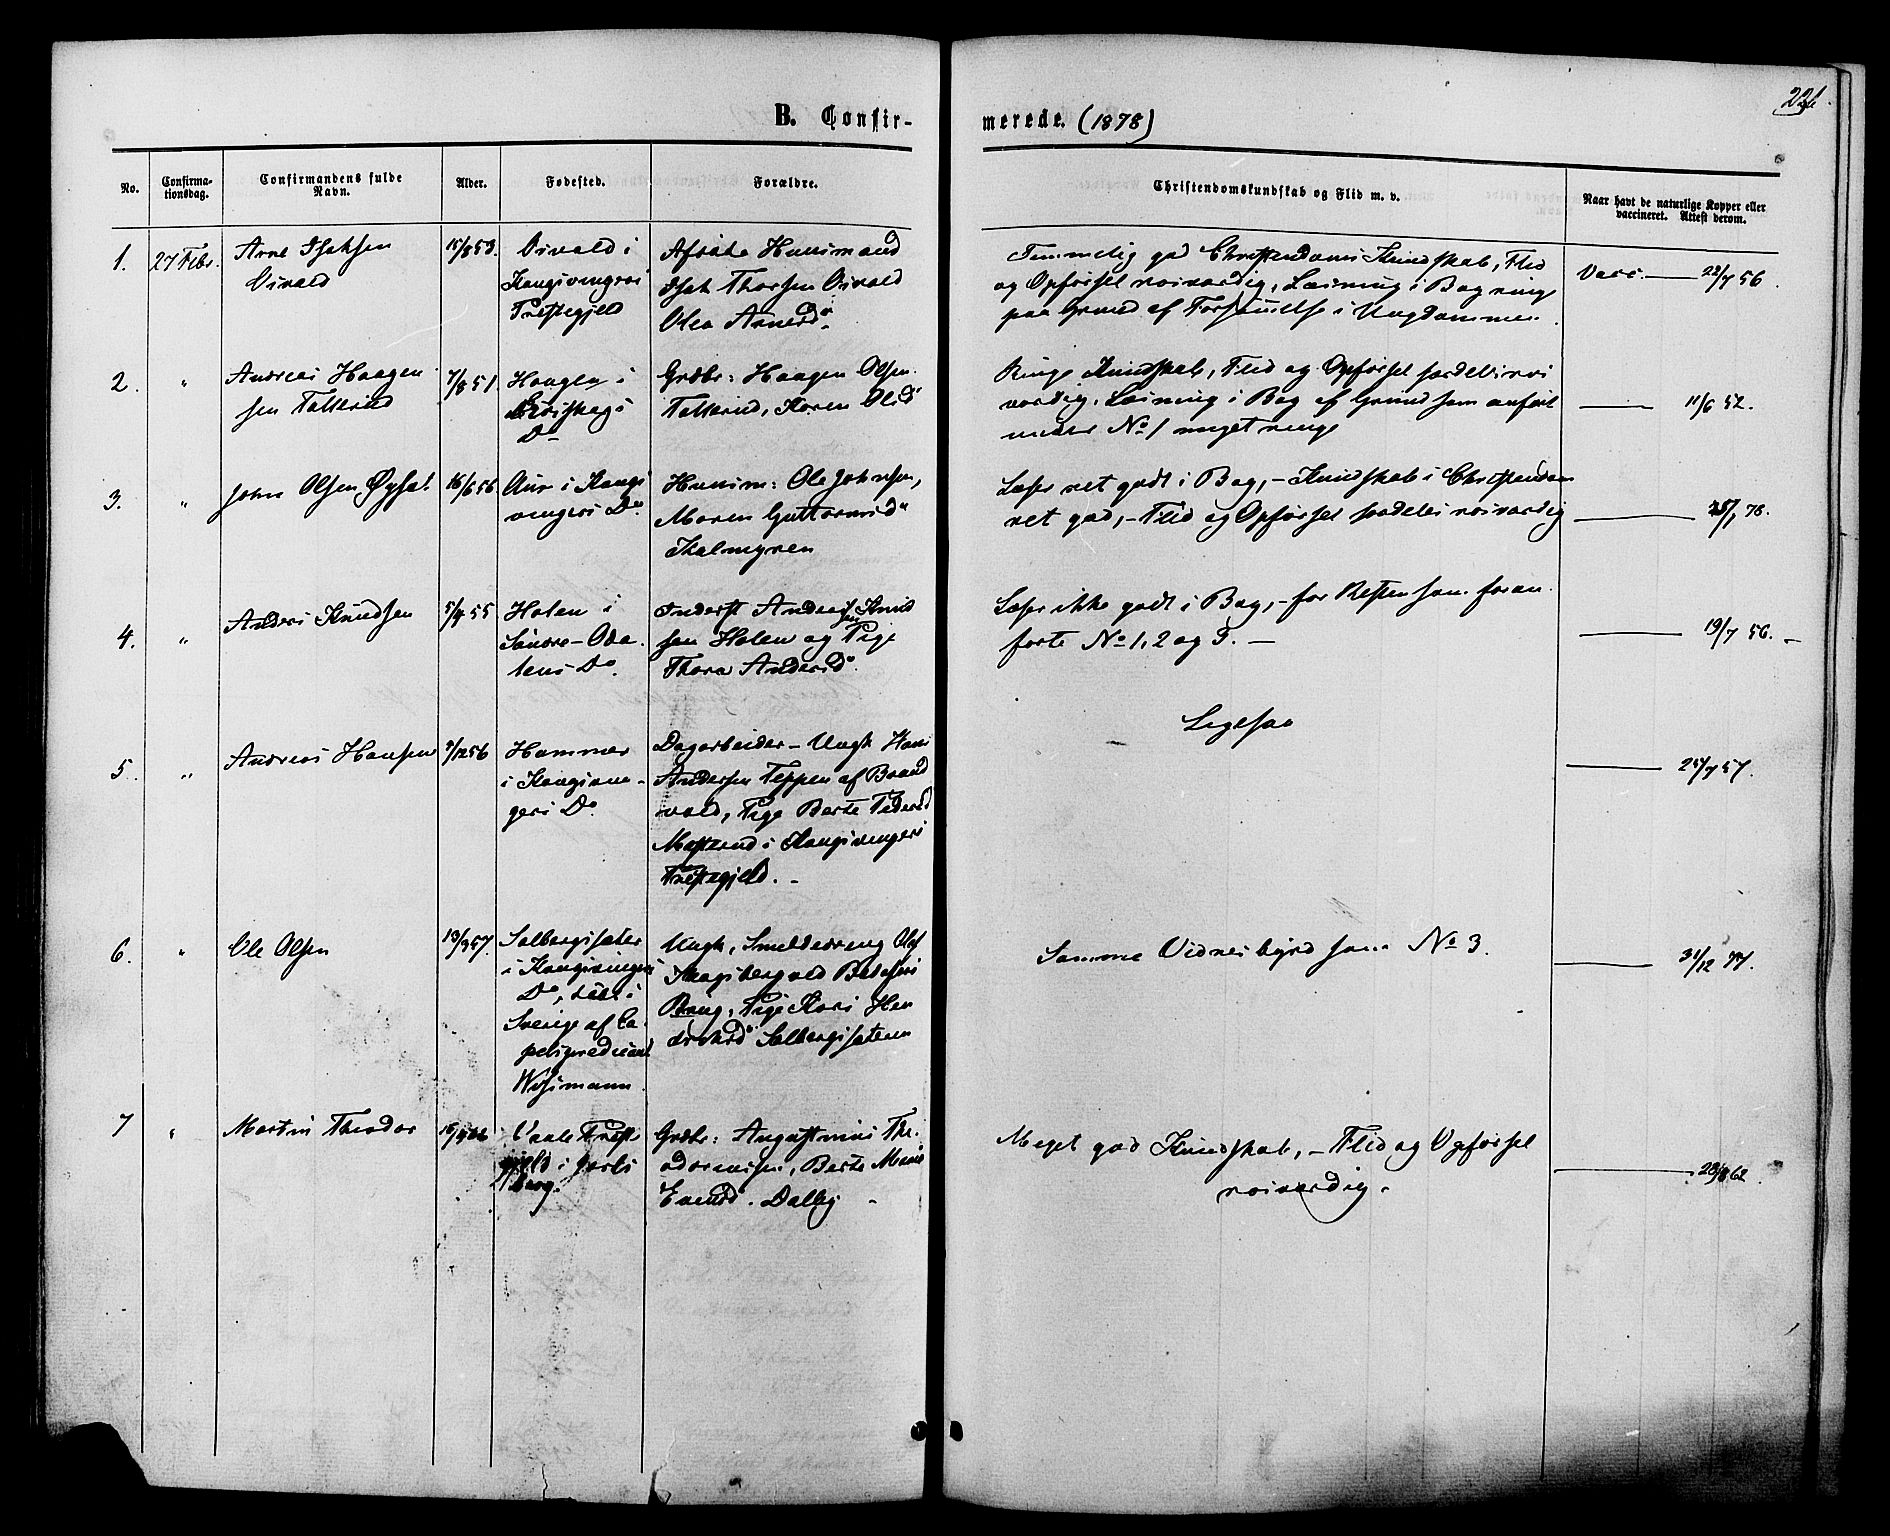 SAH, Vardal prestekontor, H/Ha/Haa/L0007: Ministerialbok nr. 7, 1867-1878, s. 236